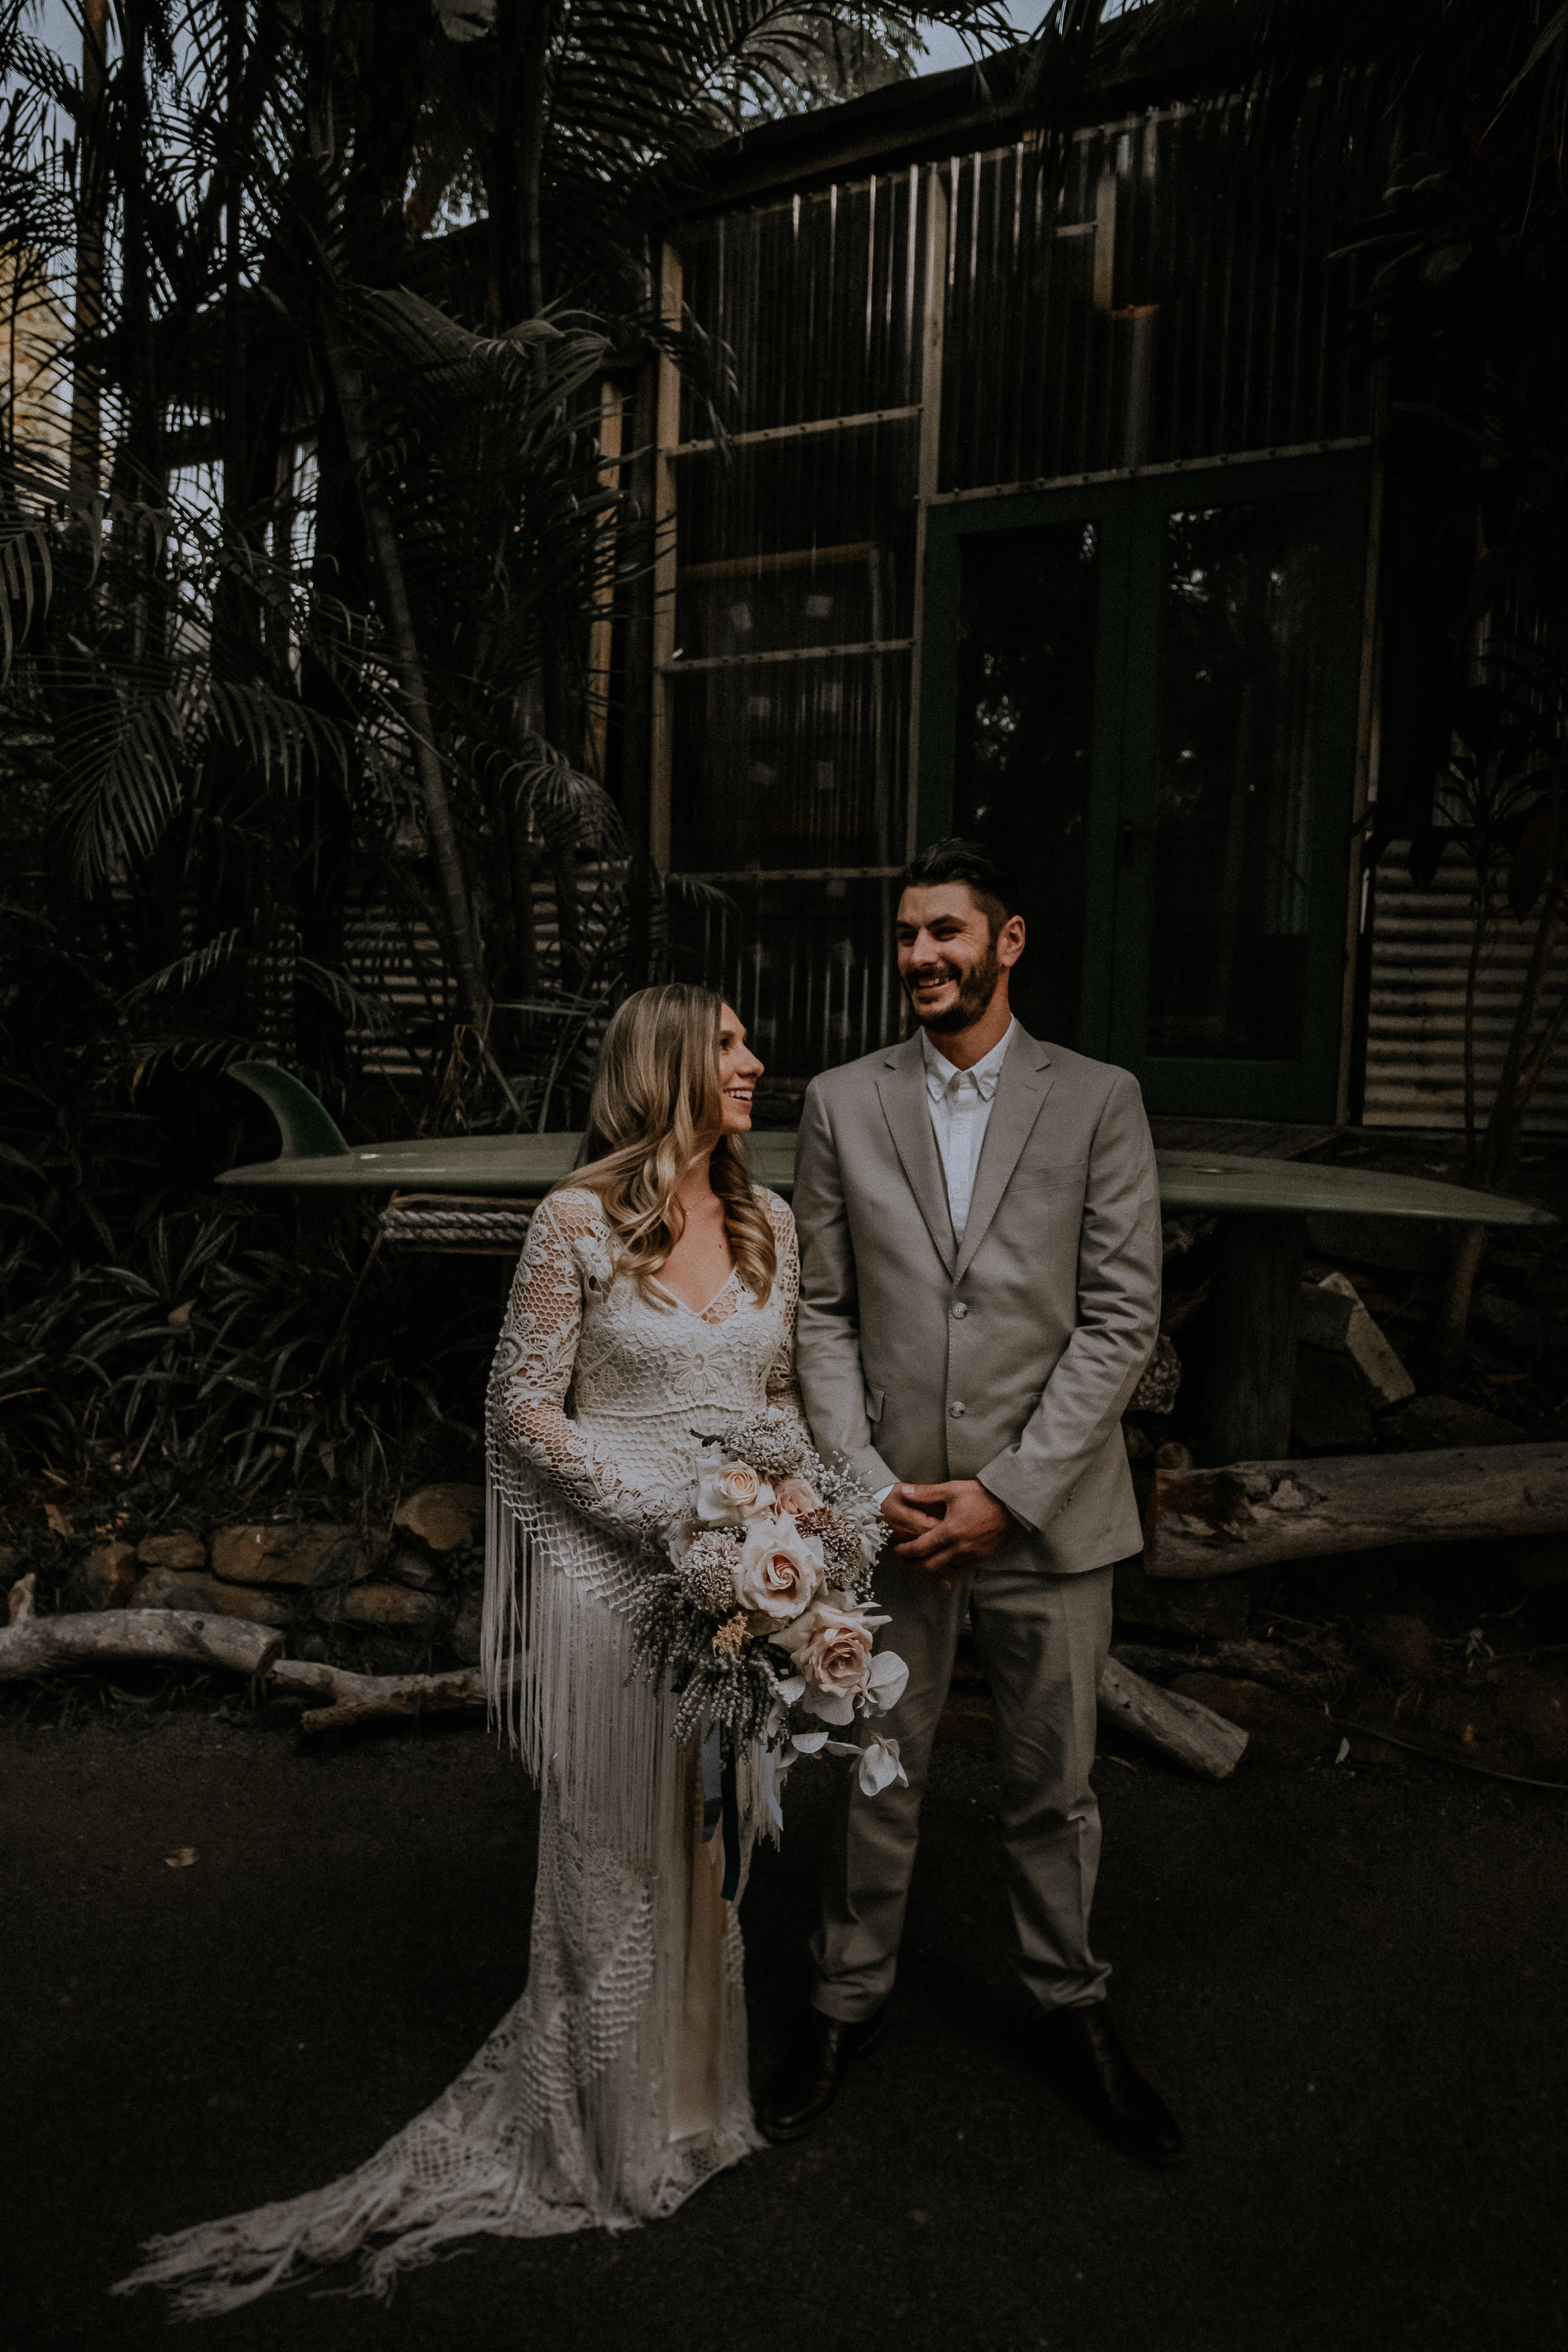 S&A Elopement - Kings & Thieves - Shred 'Til Dead - Central Coast Beach Forest Wedding - 317.jpg